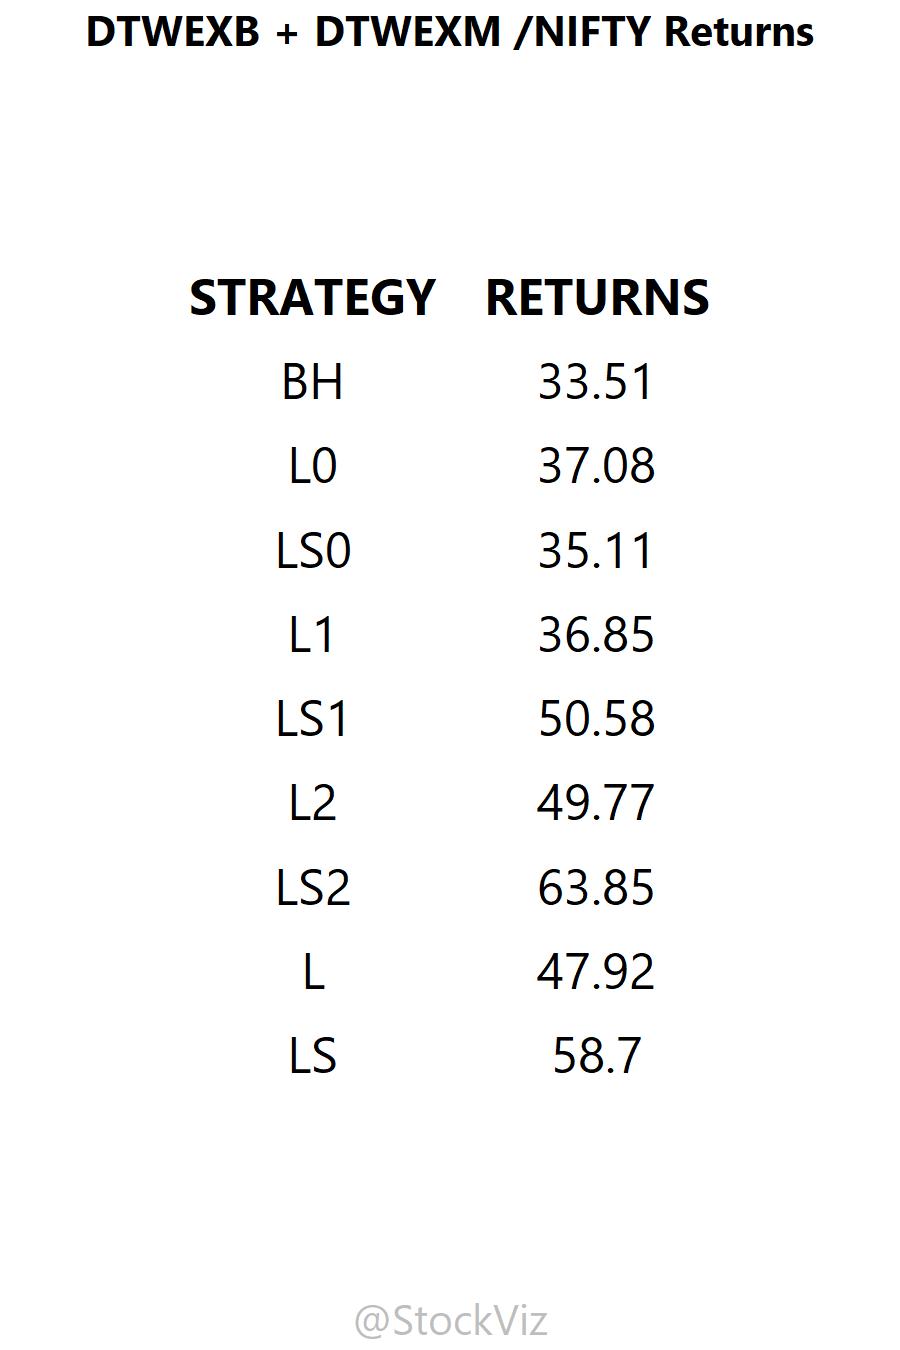 DTWEXB%2BDTWEXM.NIFTY cumulative returns